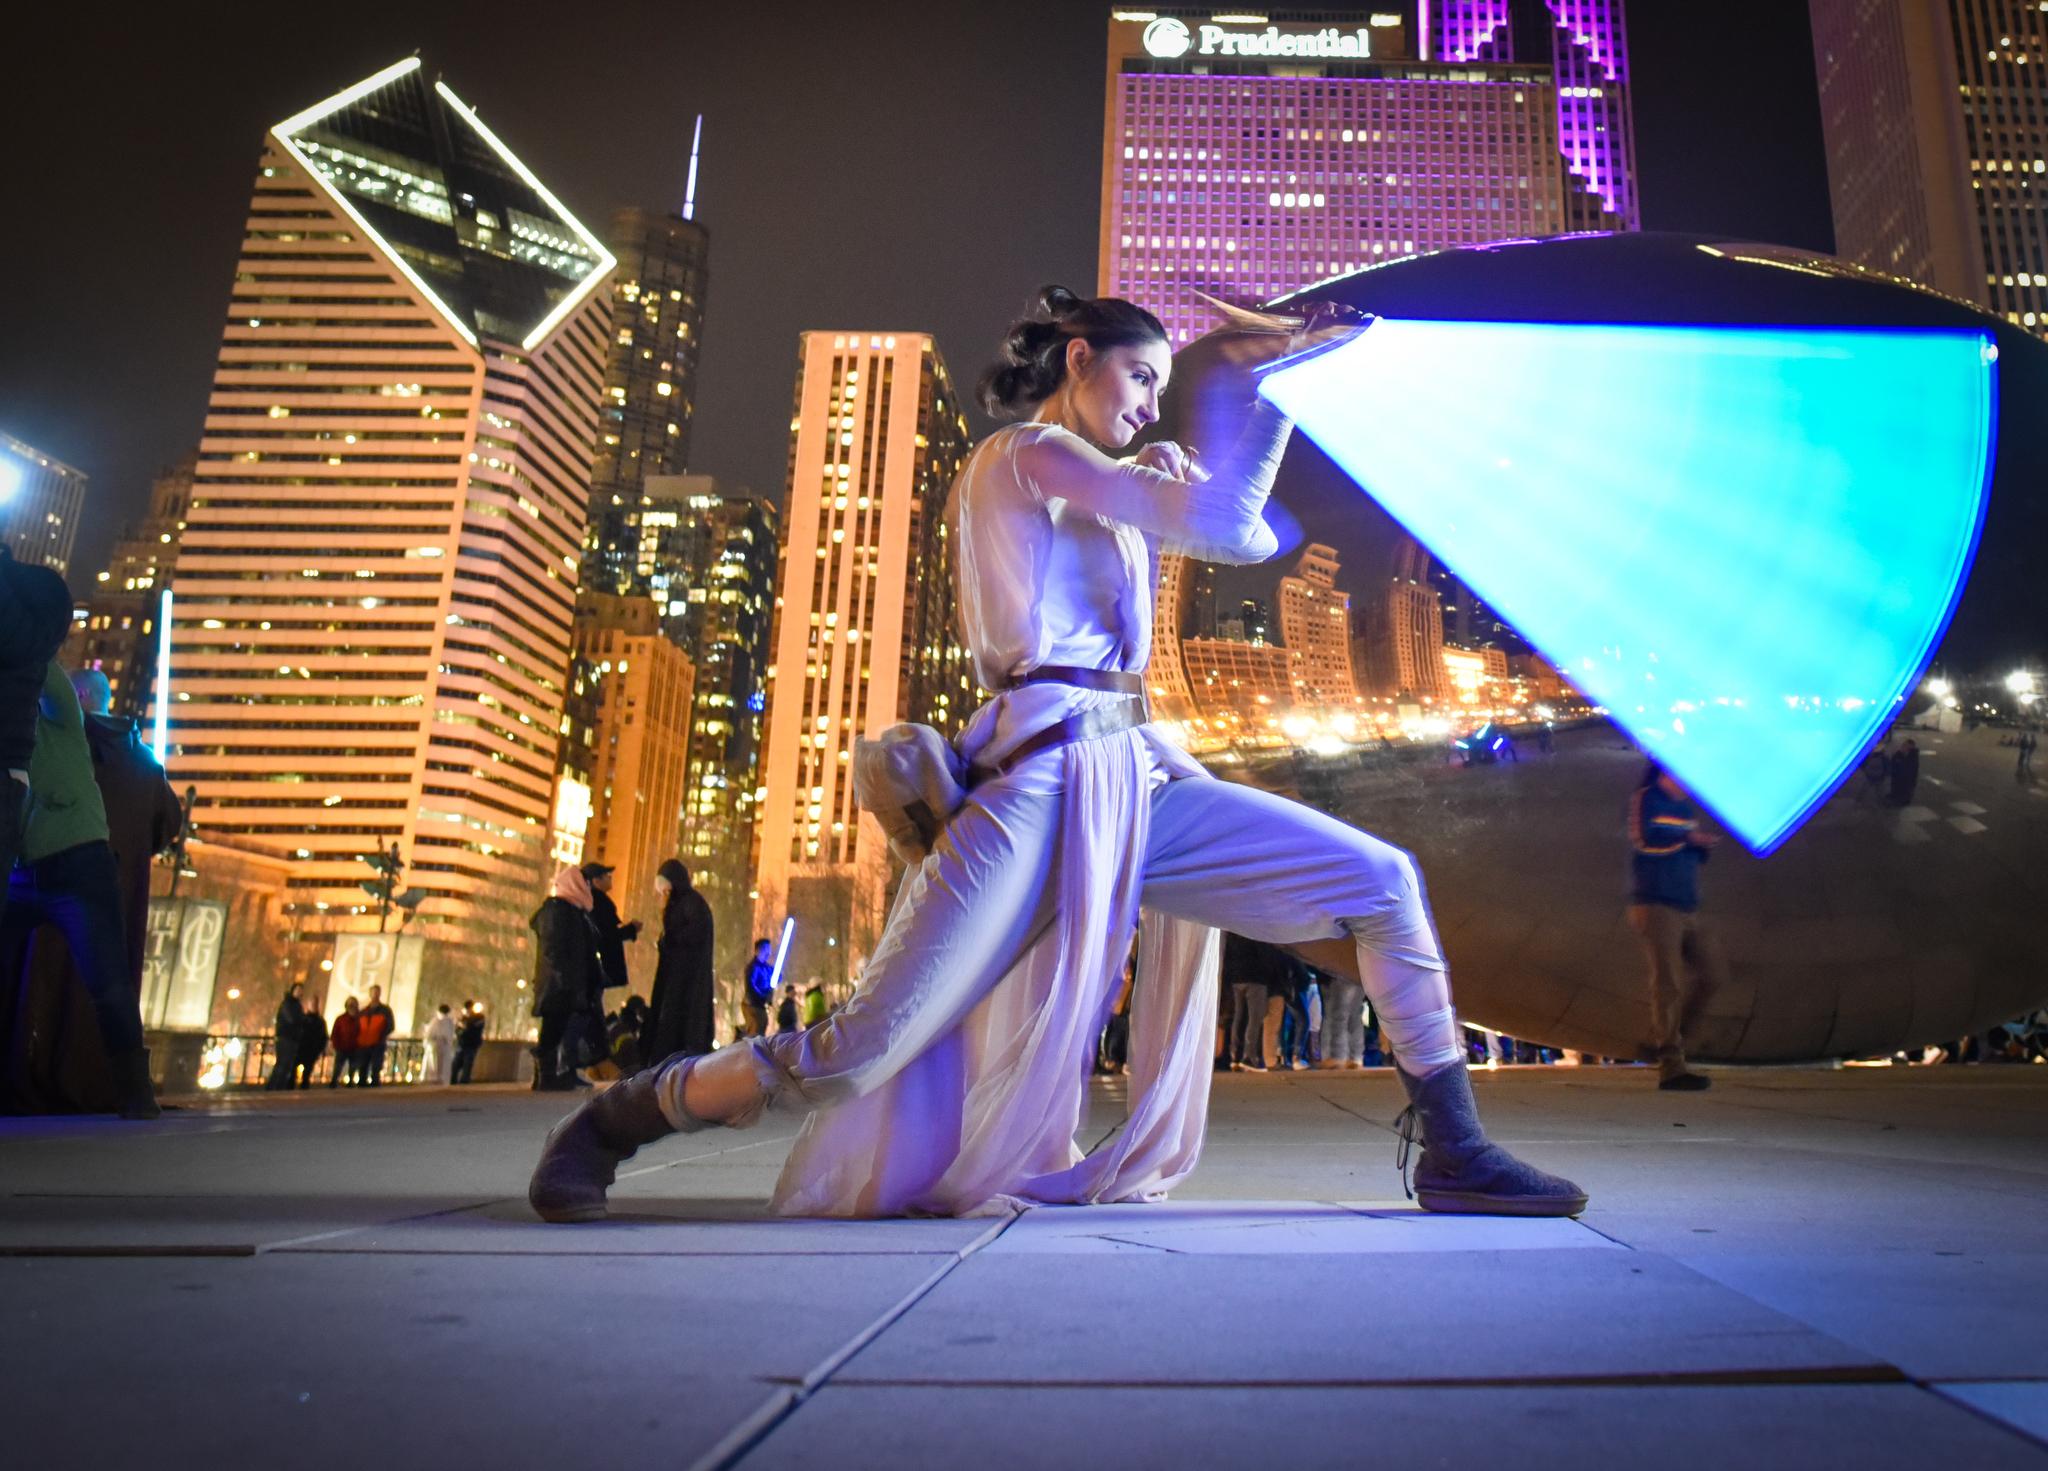 2019.04.14 - Star Wars Celebration Chicago 288912.JPG